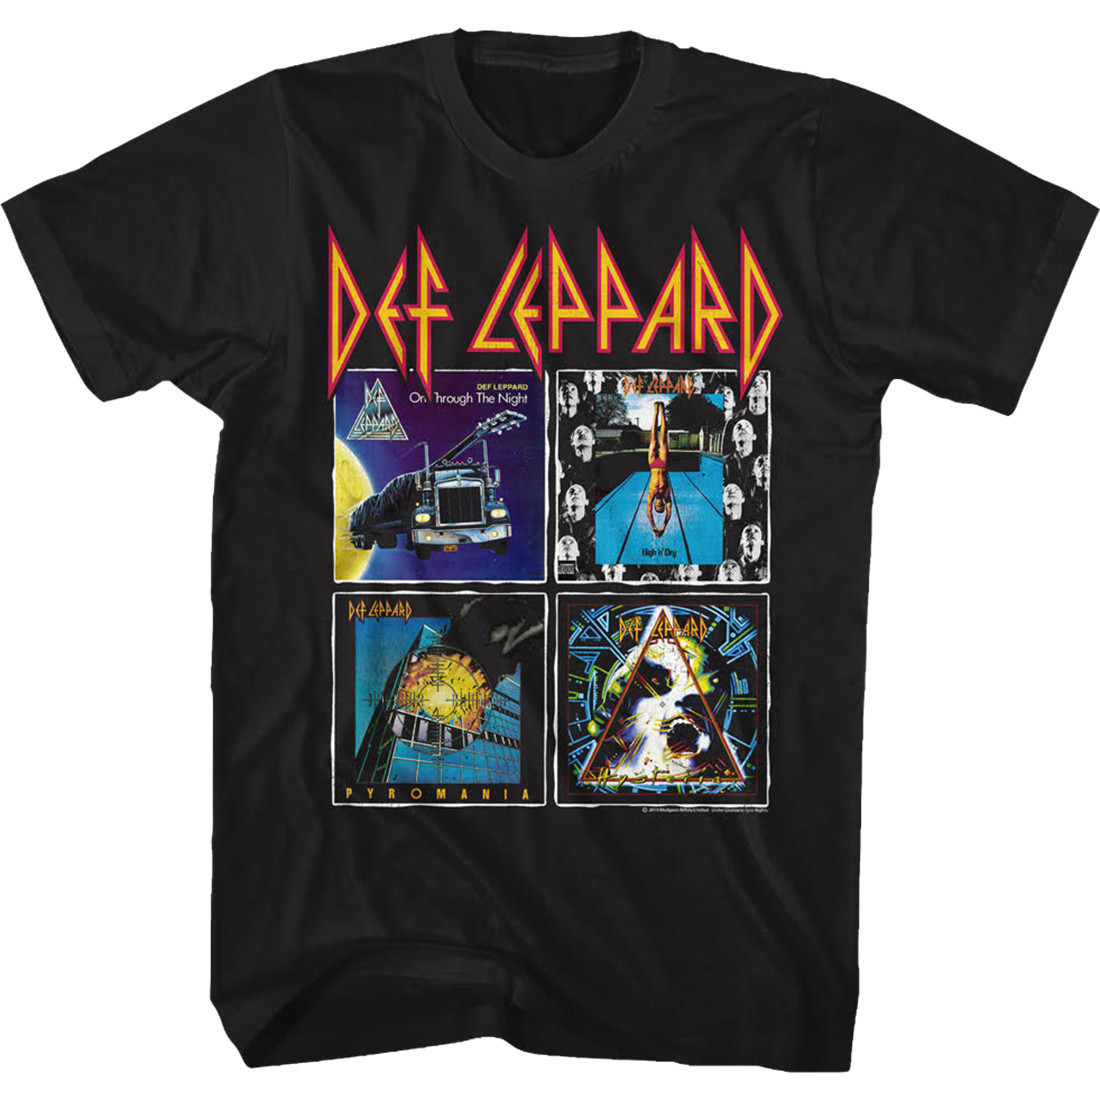 Def Leppard Albums Black T-Shirt